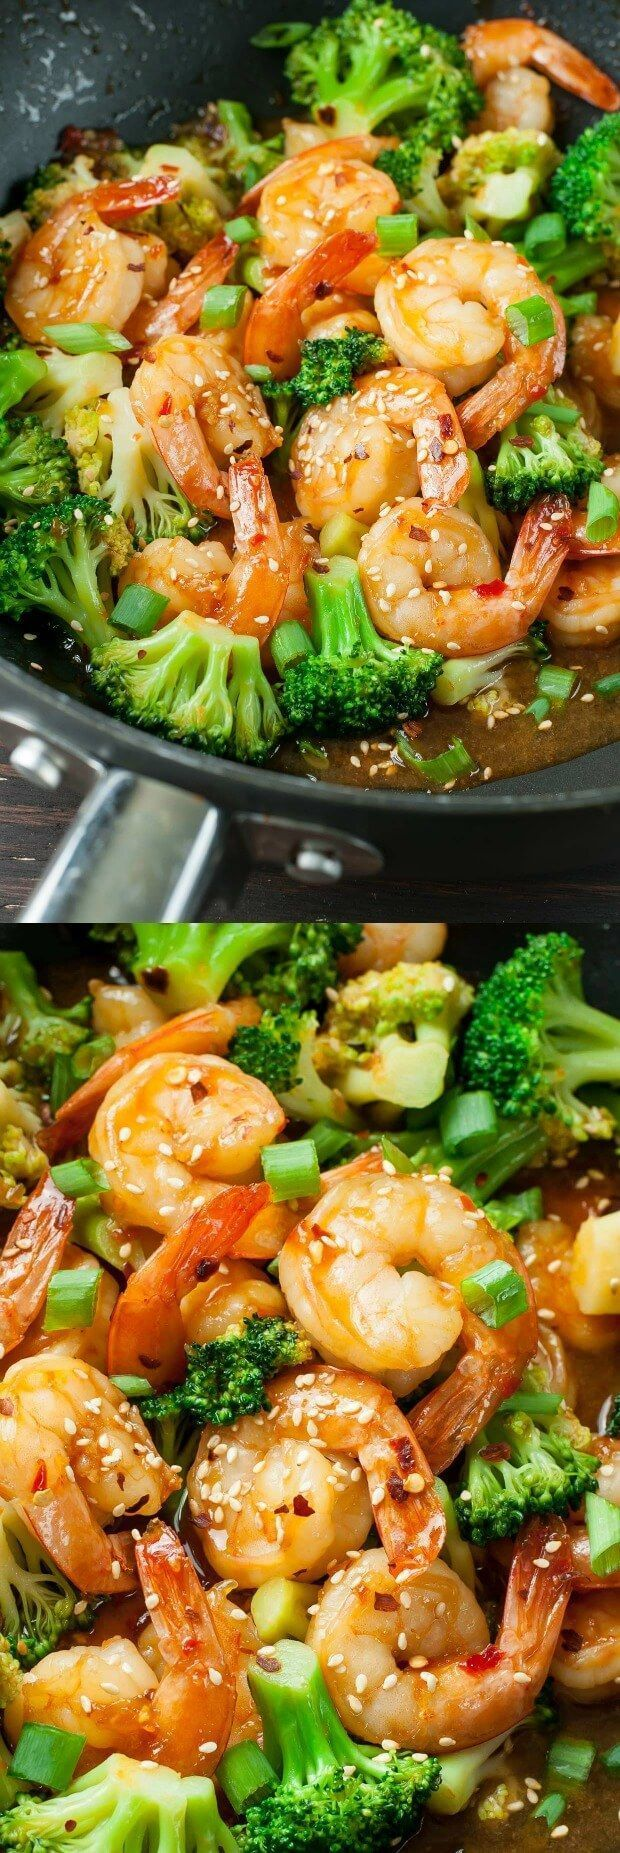 Szechuan-Garnele und Brokkoli - Seafood Recipes - #Brokkoli #Recipes #Seafood #SzechuanGarnele #UND #seafooddishes